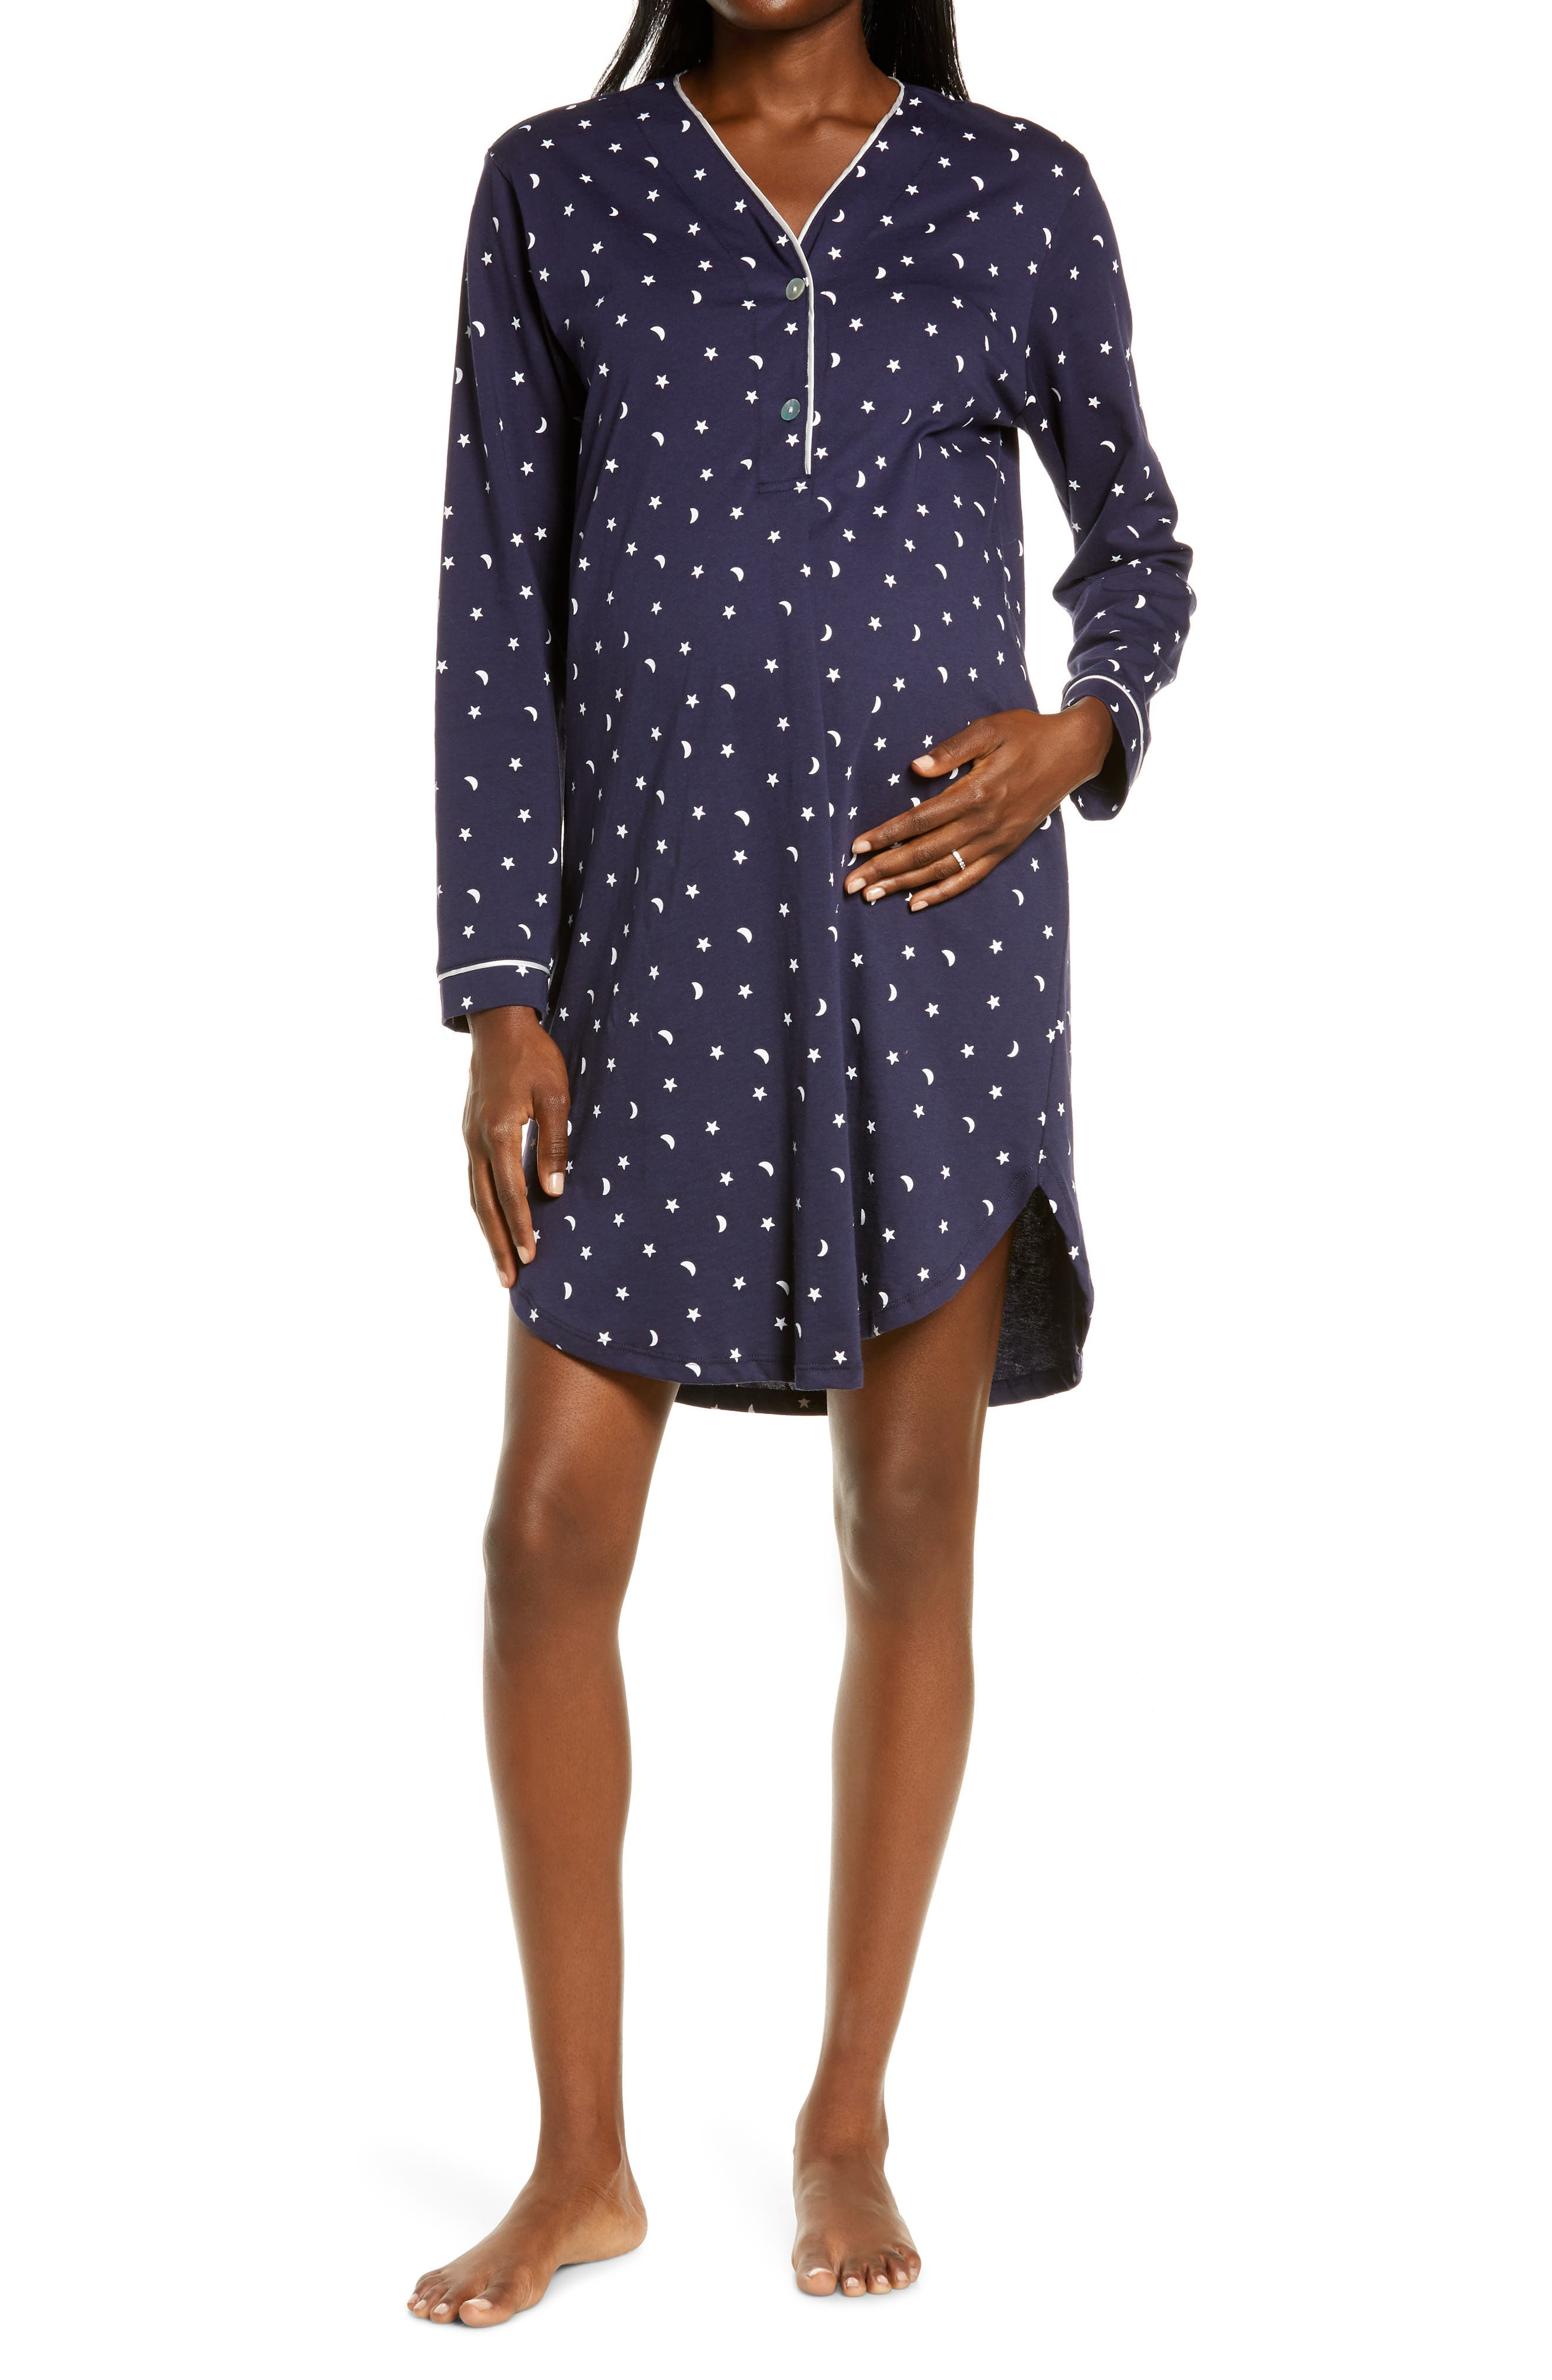 Starry Night Maternity/nursing Nightshirt